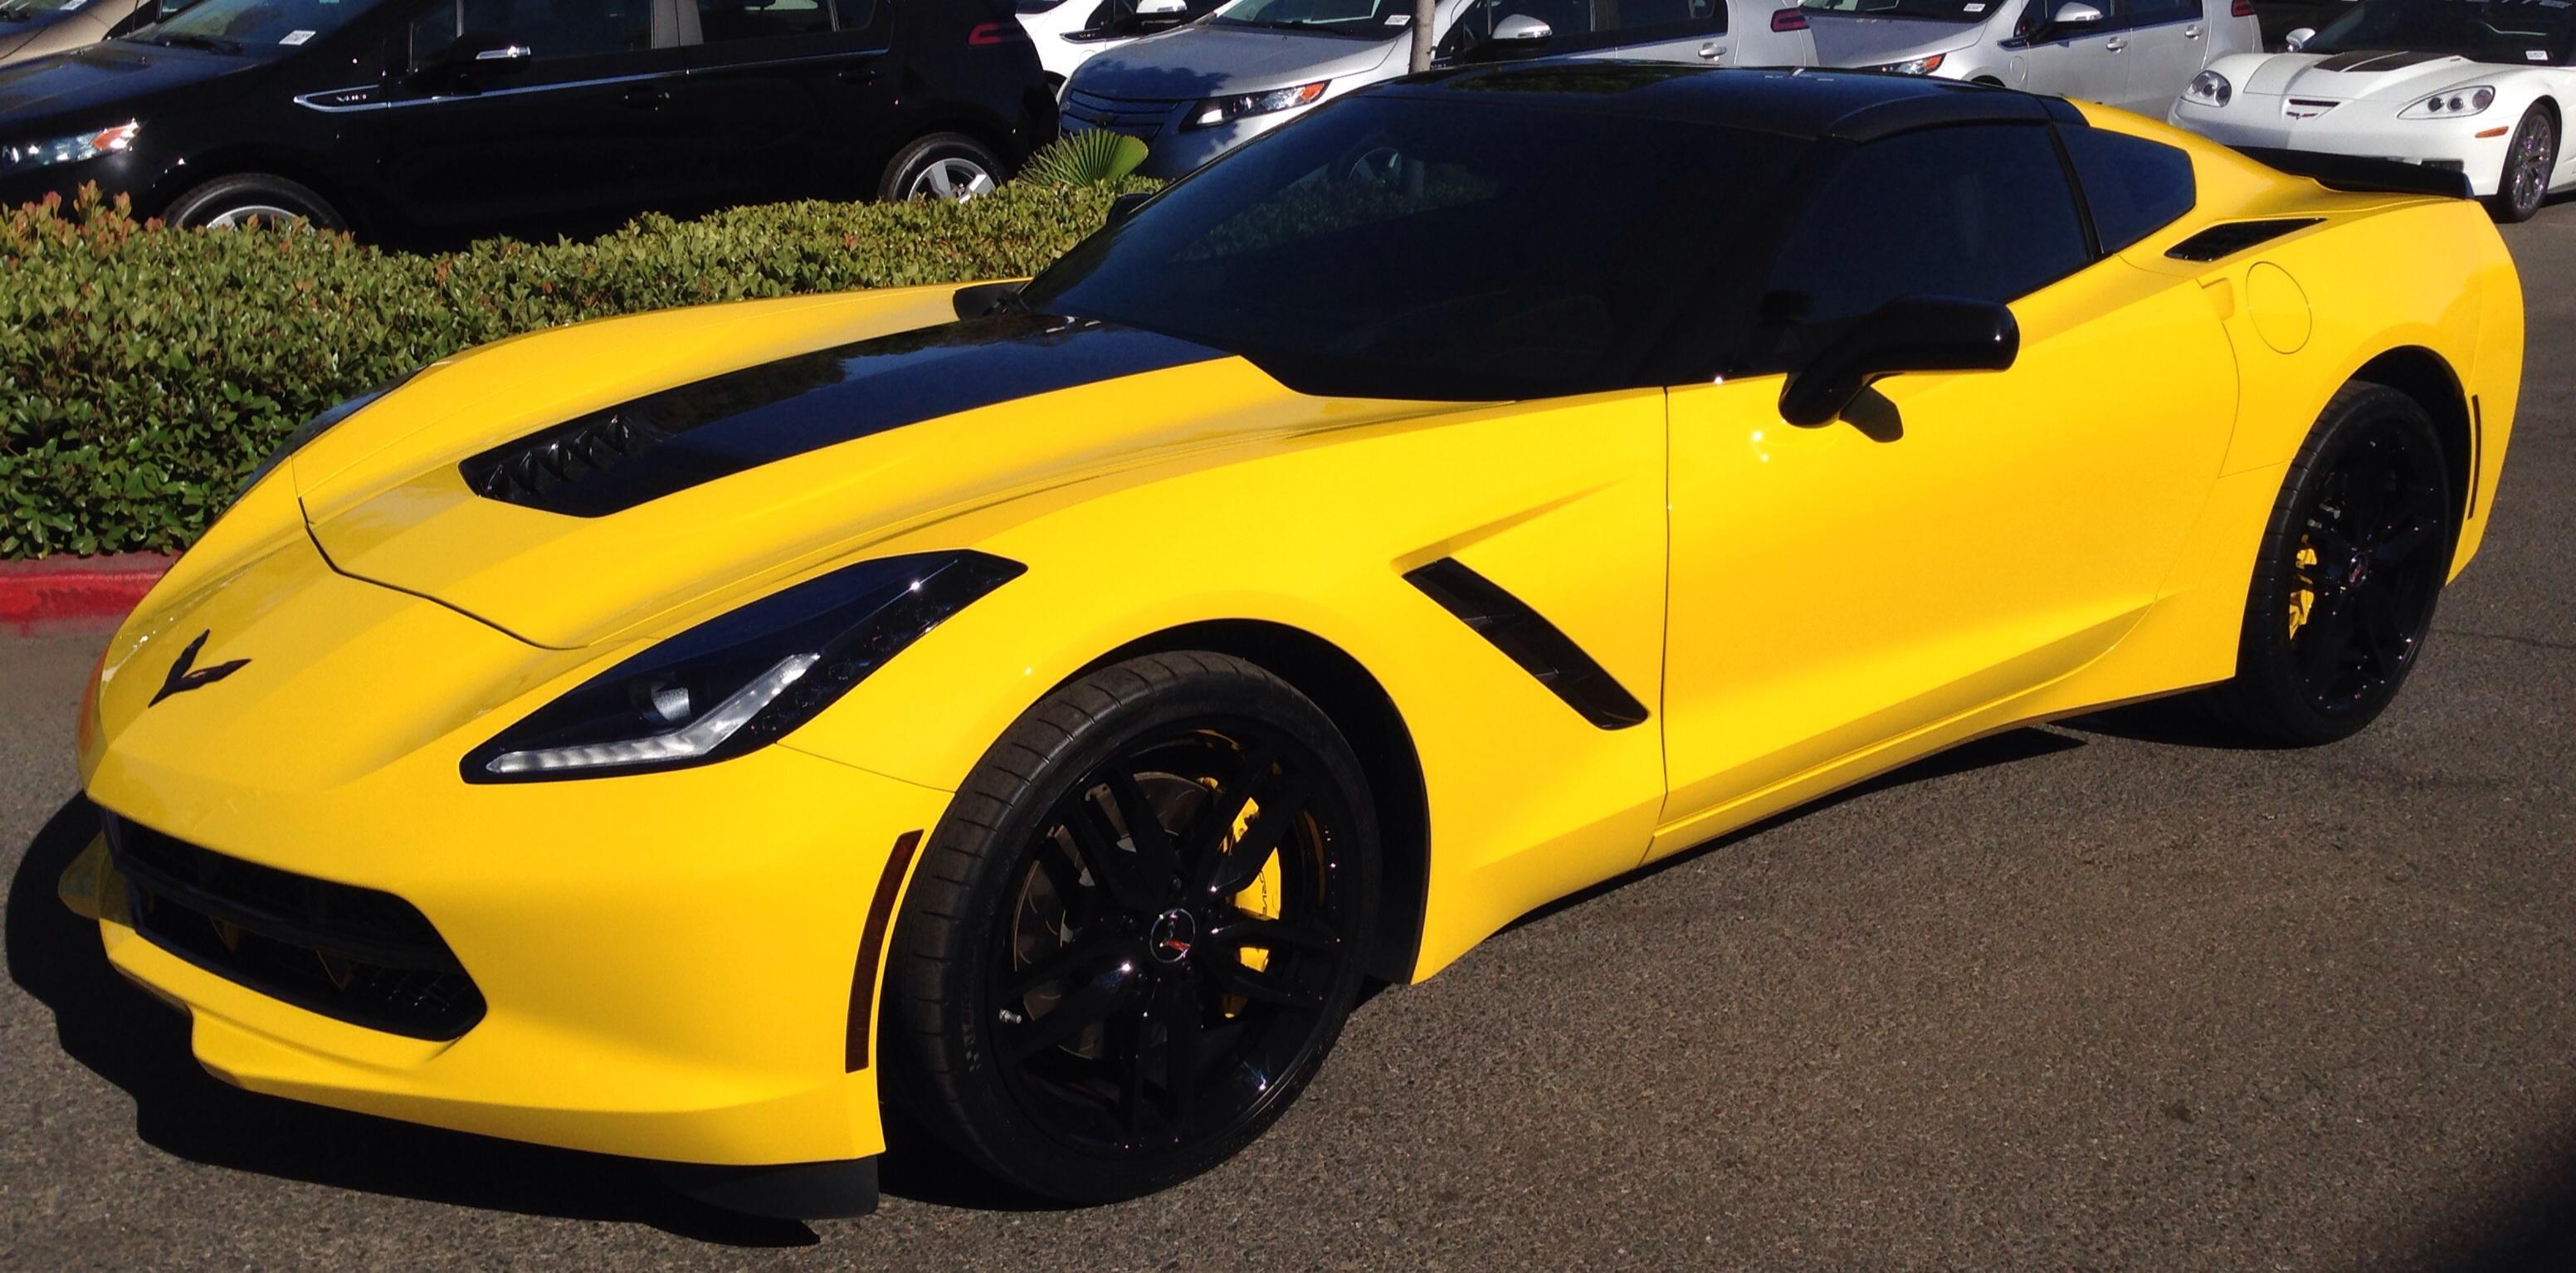 Explore the 2019 Corvette Grand Sport this legendary sports car offers 460 horsepower amp 060 in 36 seconds